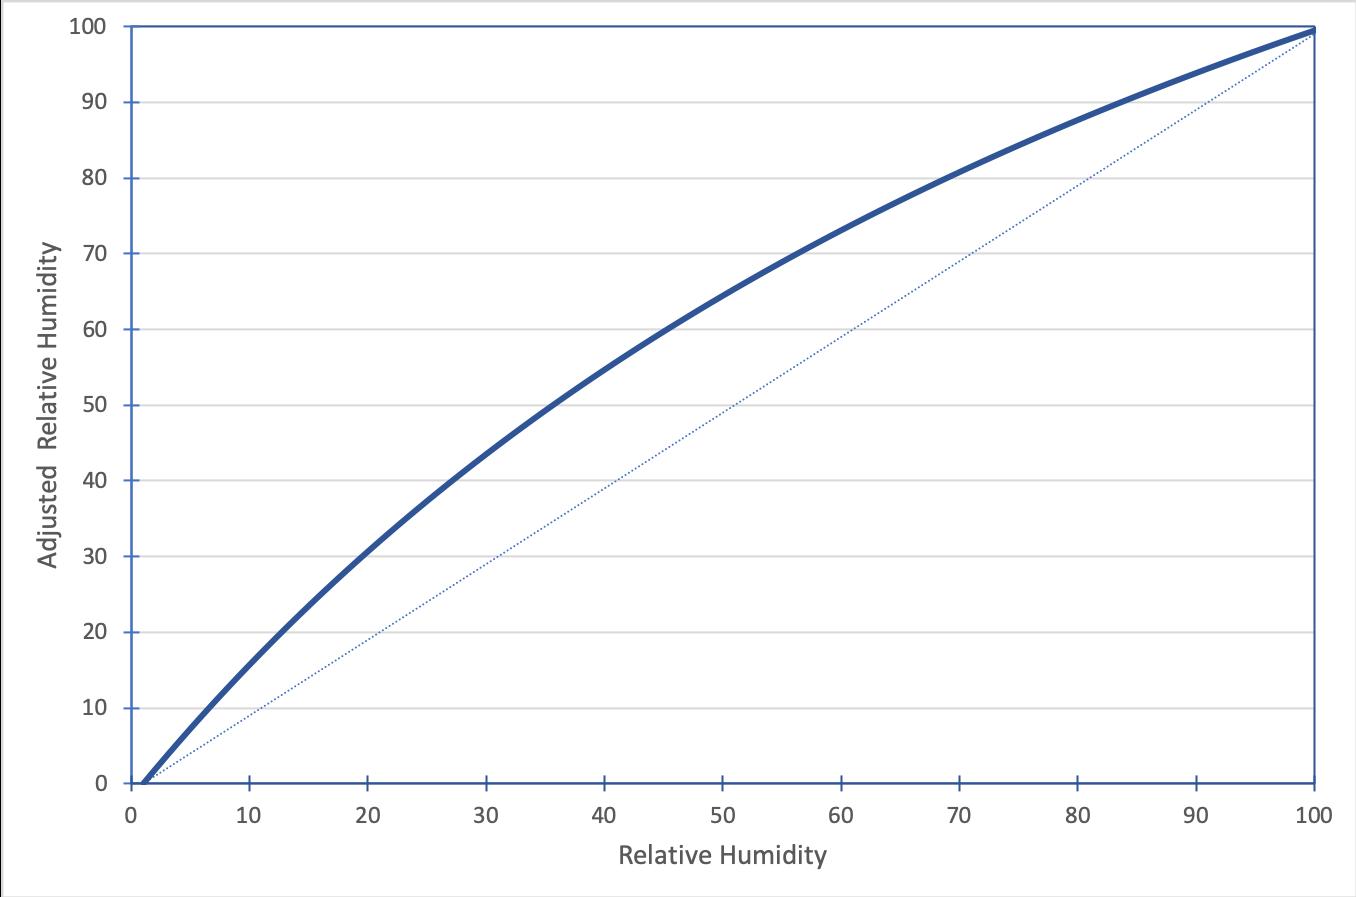 A line graph representing the Relative Humidity adjustment formula